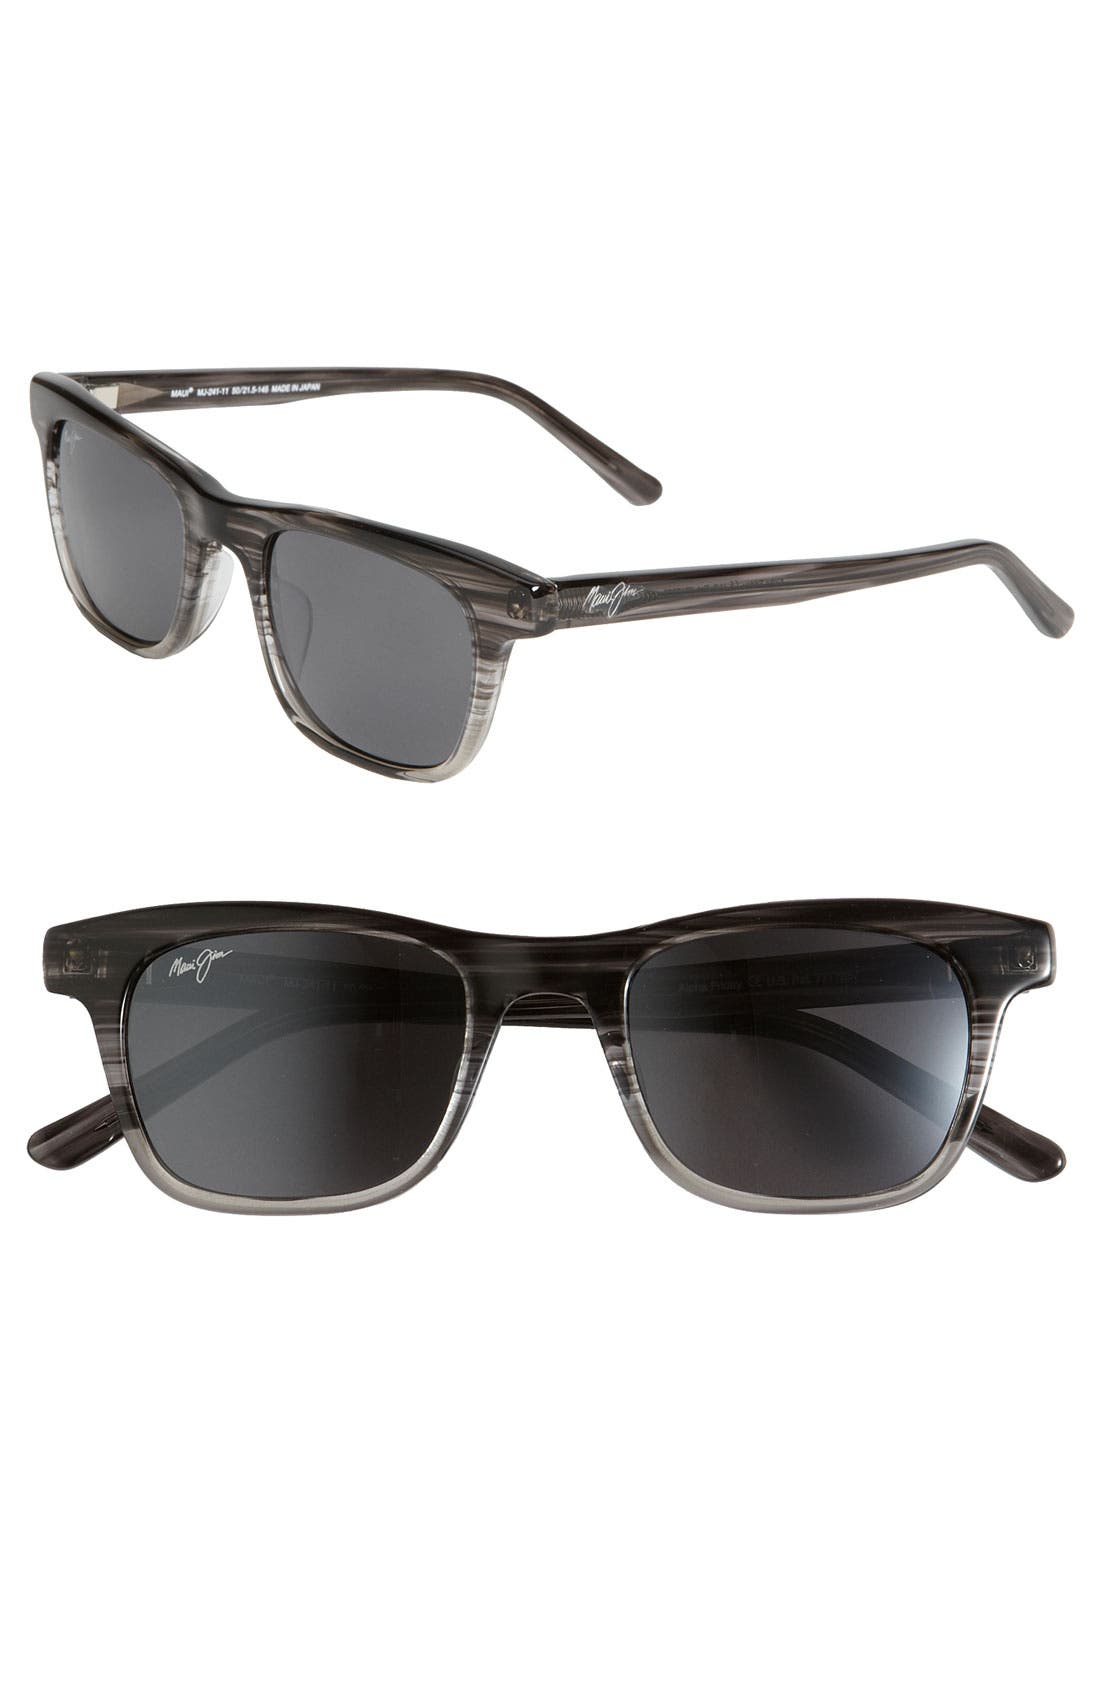 Main Image - Maui Jim 'Aloha Friday - PolarizedPlus®2' Retro Inspired Sunglasses